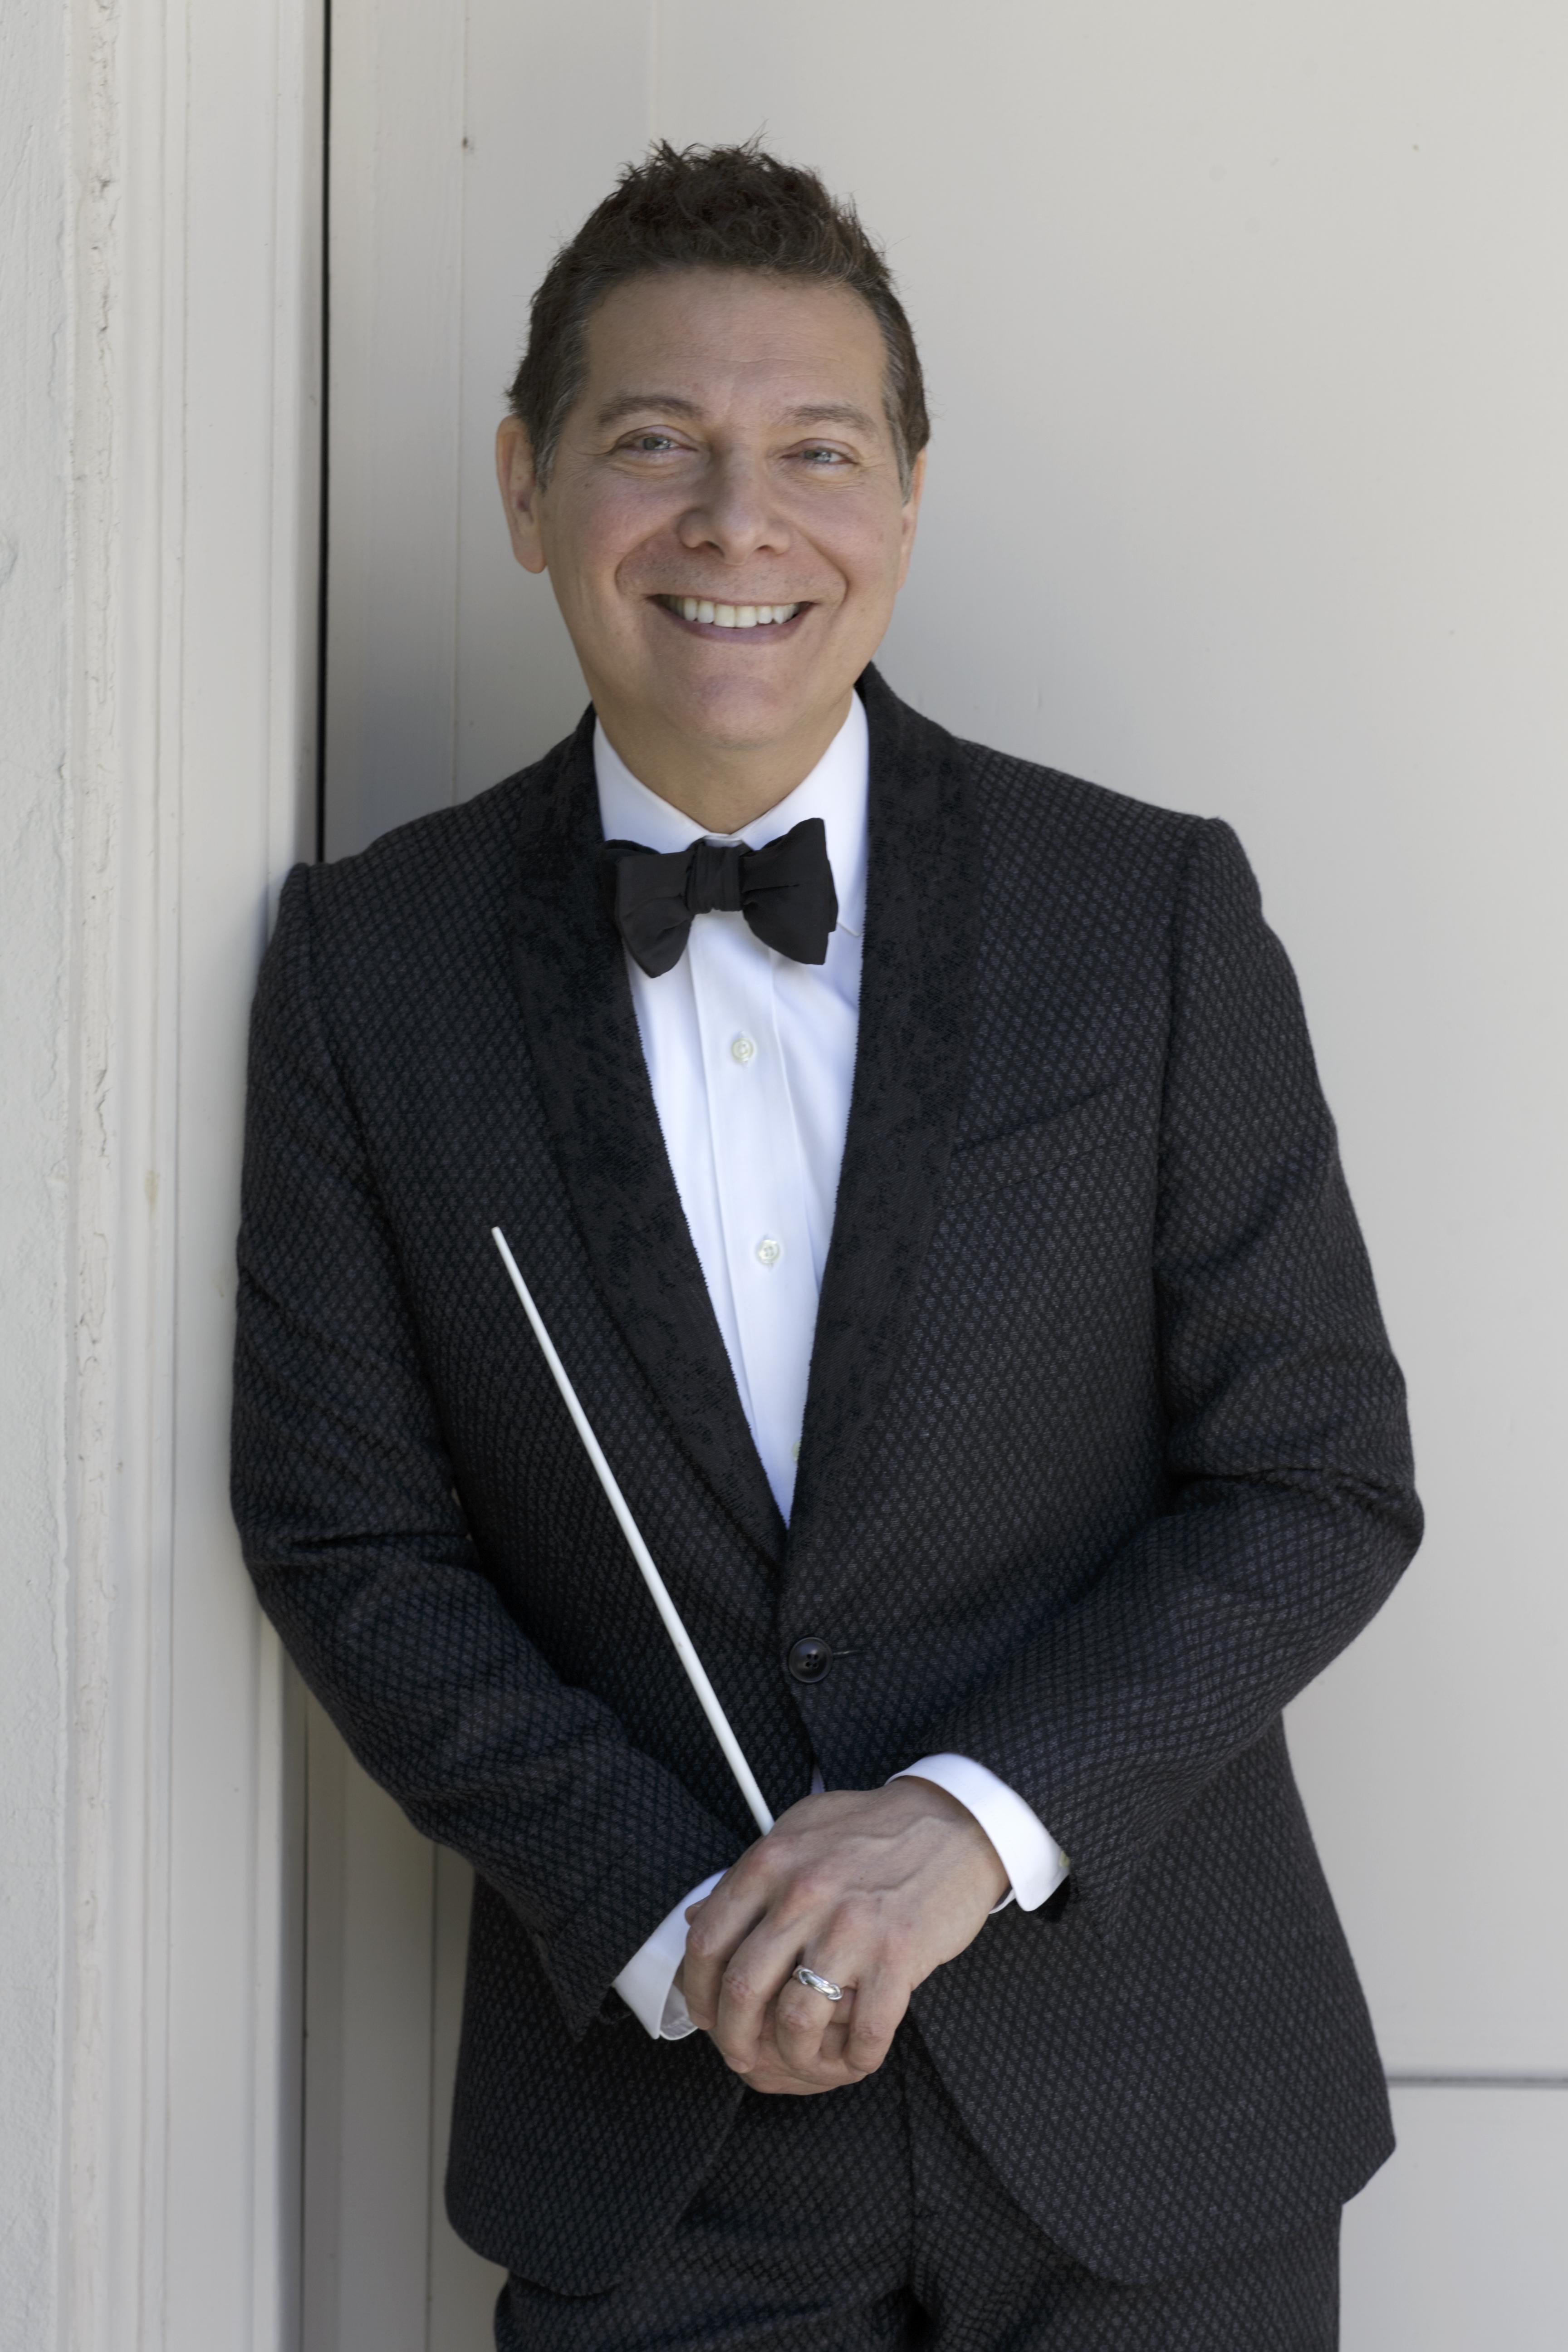 Michael Feinstein, conductor